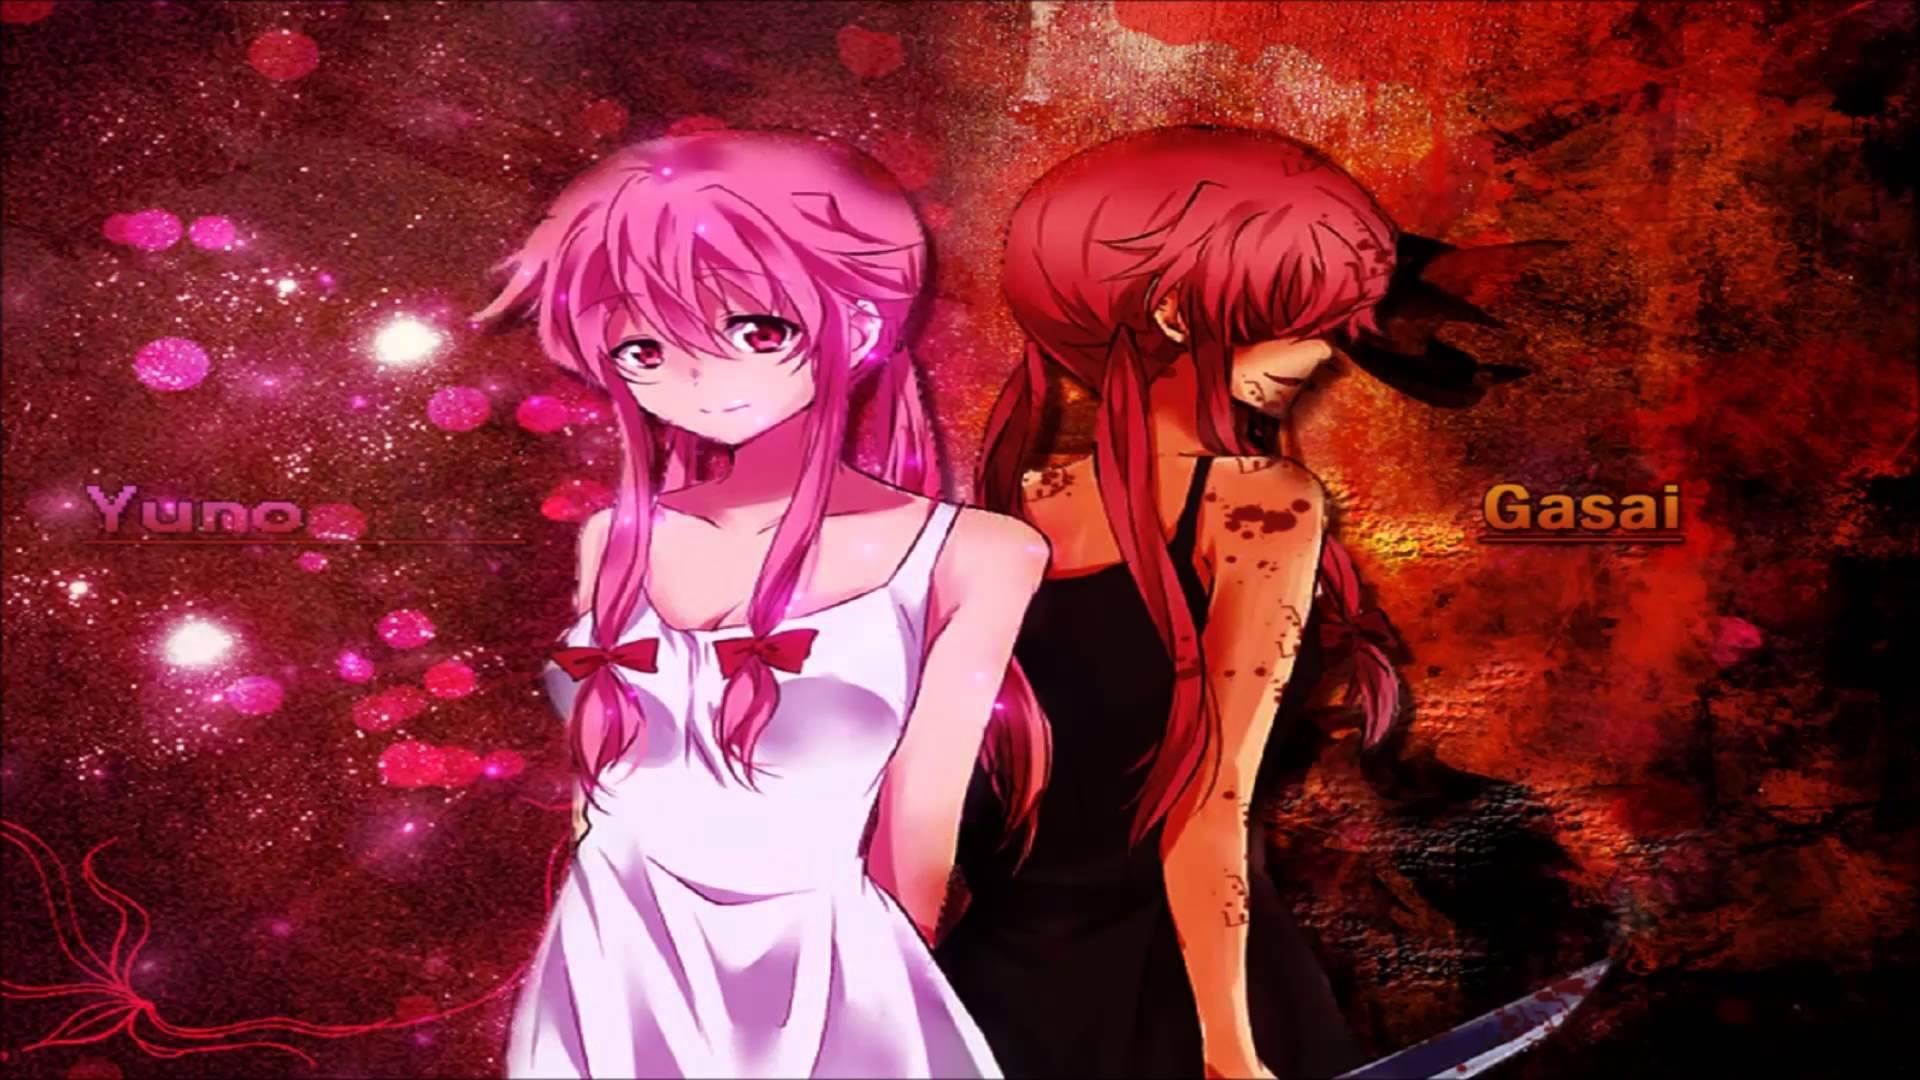 Yuno Gasai Light Dark Full HD Wallpaper And Background Image